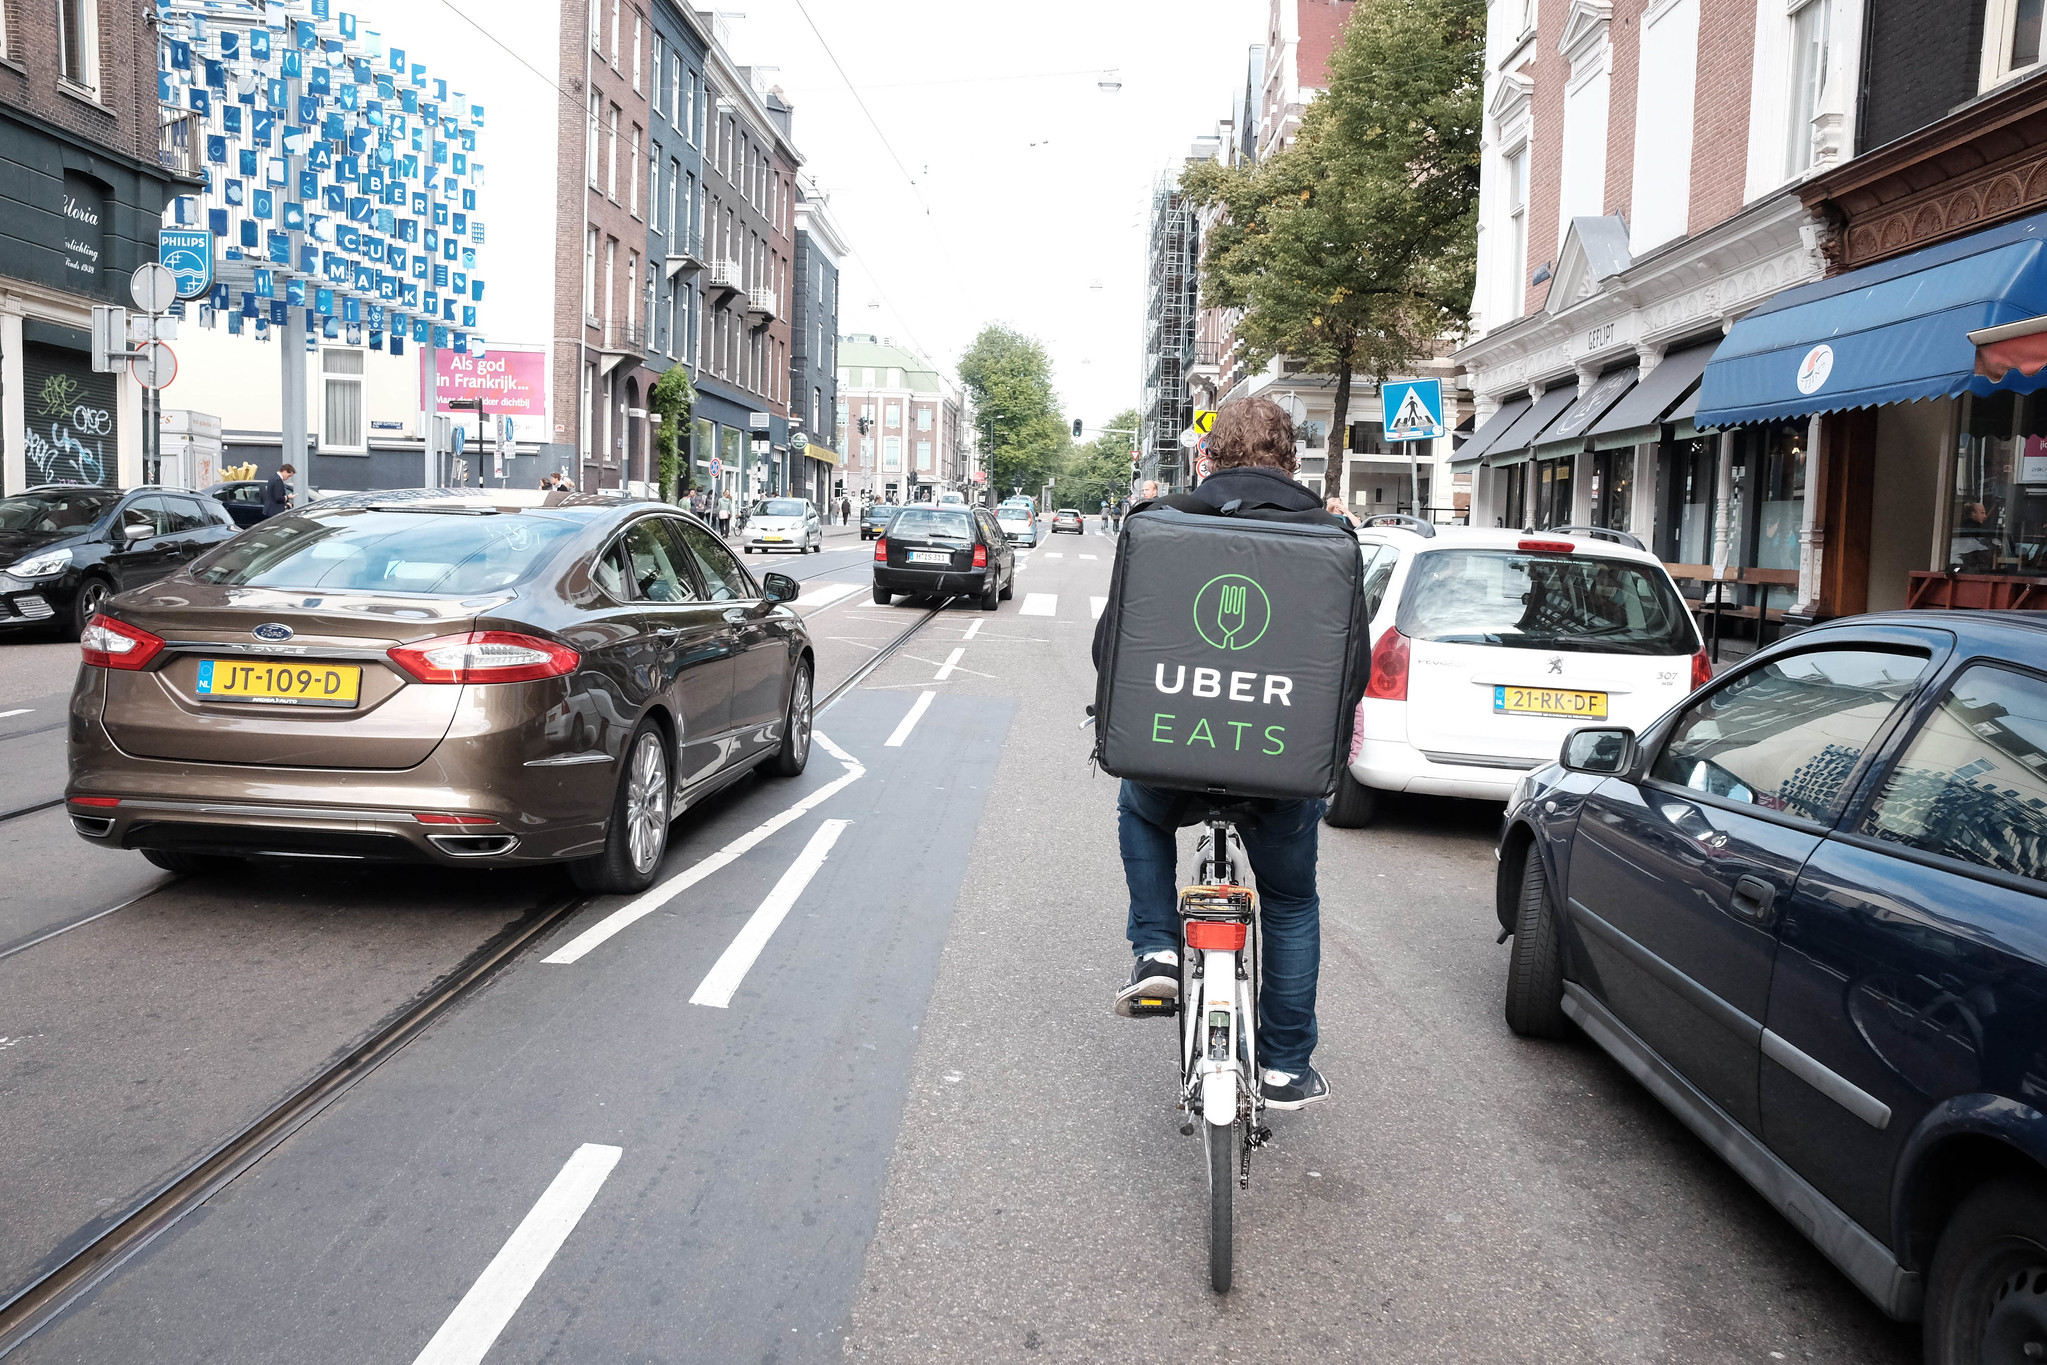 Uber Eats、2つの手数料を追加。10%のサービス料と150円の少額手数料